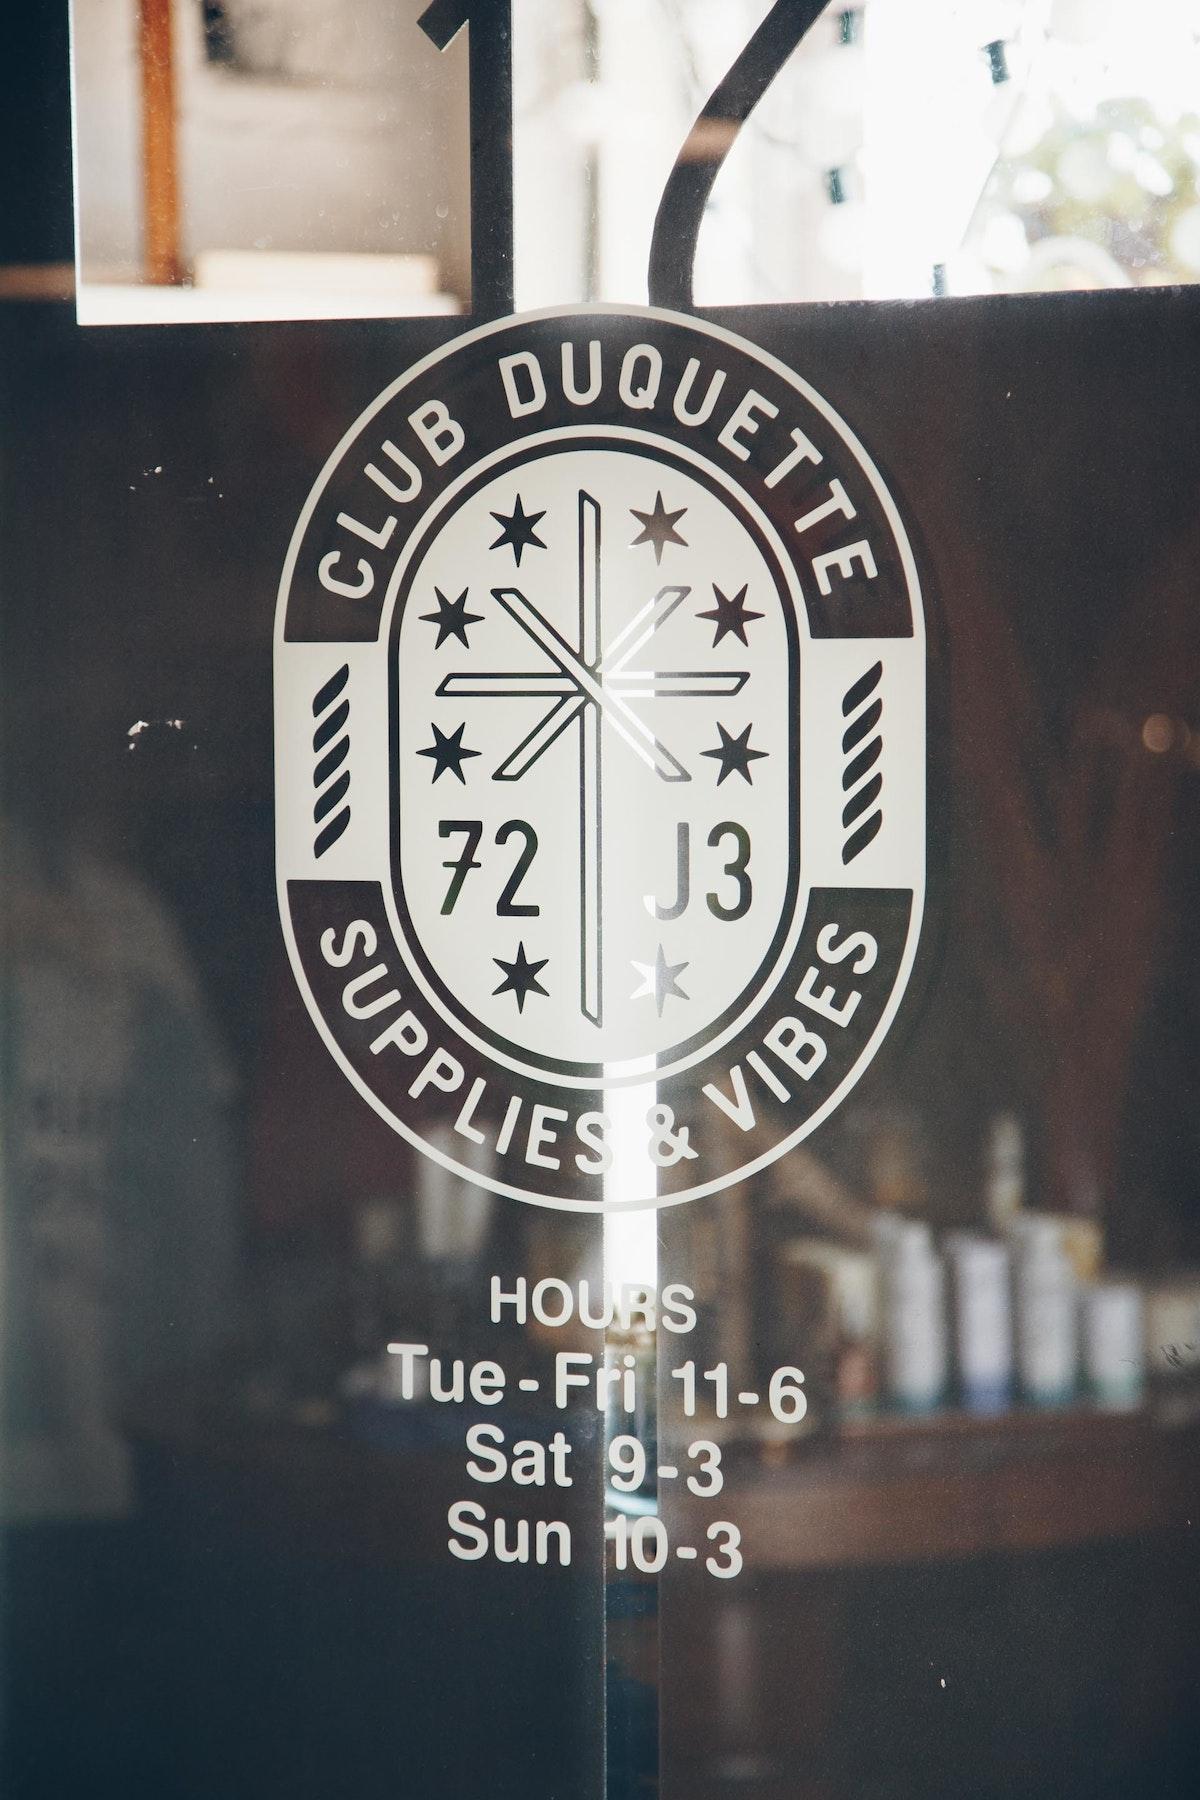 Club Duquette